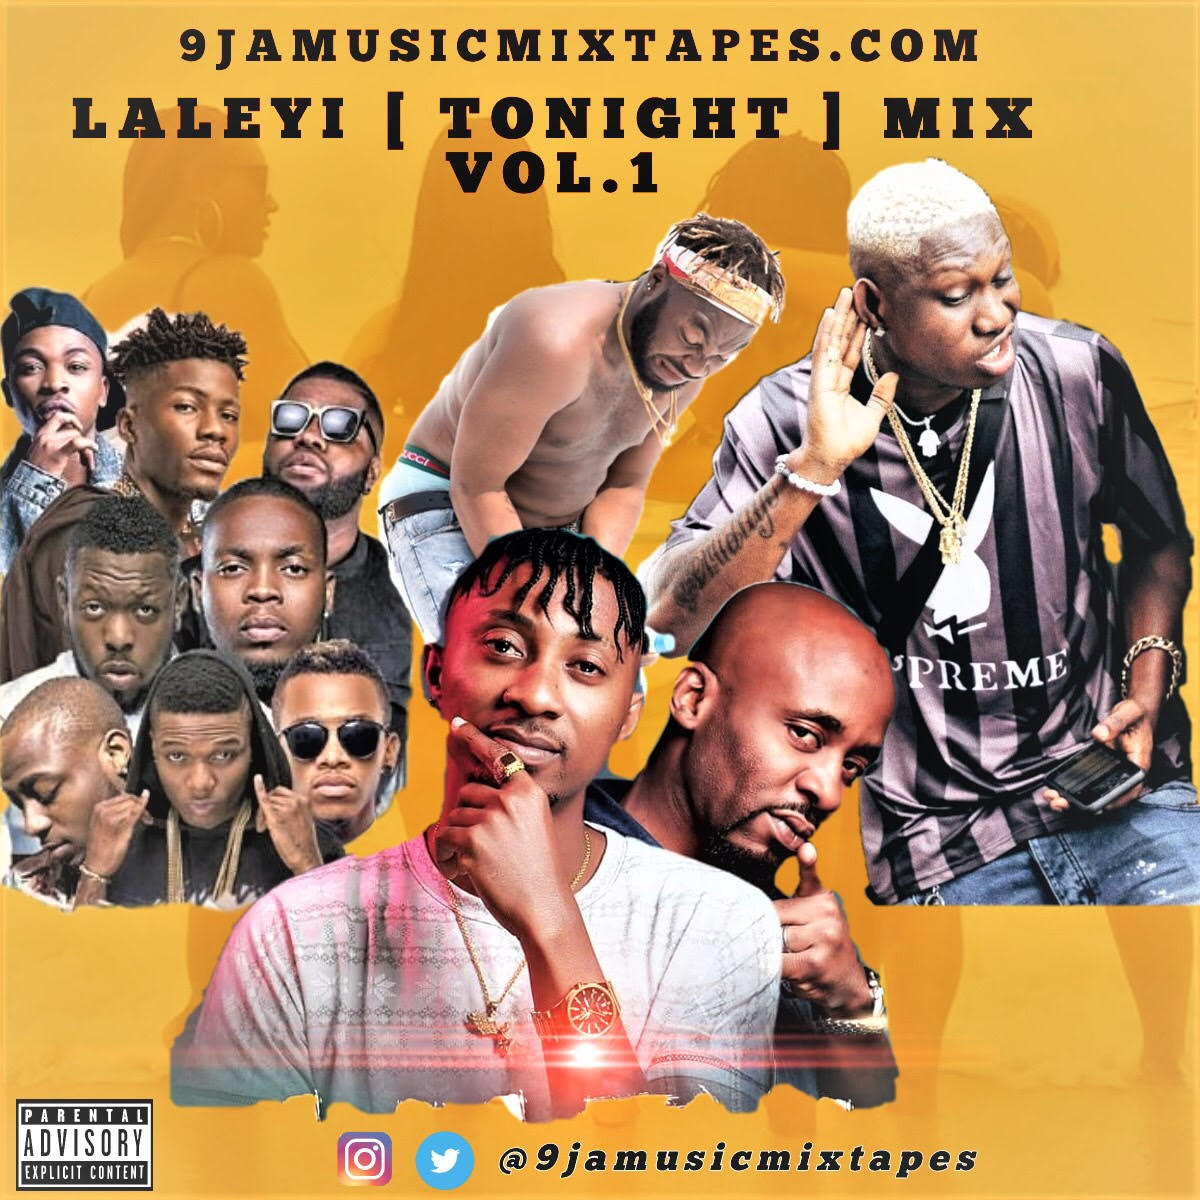 Mixtape: Laleyi [ Tonight ] Mix Vol 1 Hosted By DJ Que